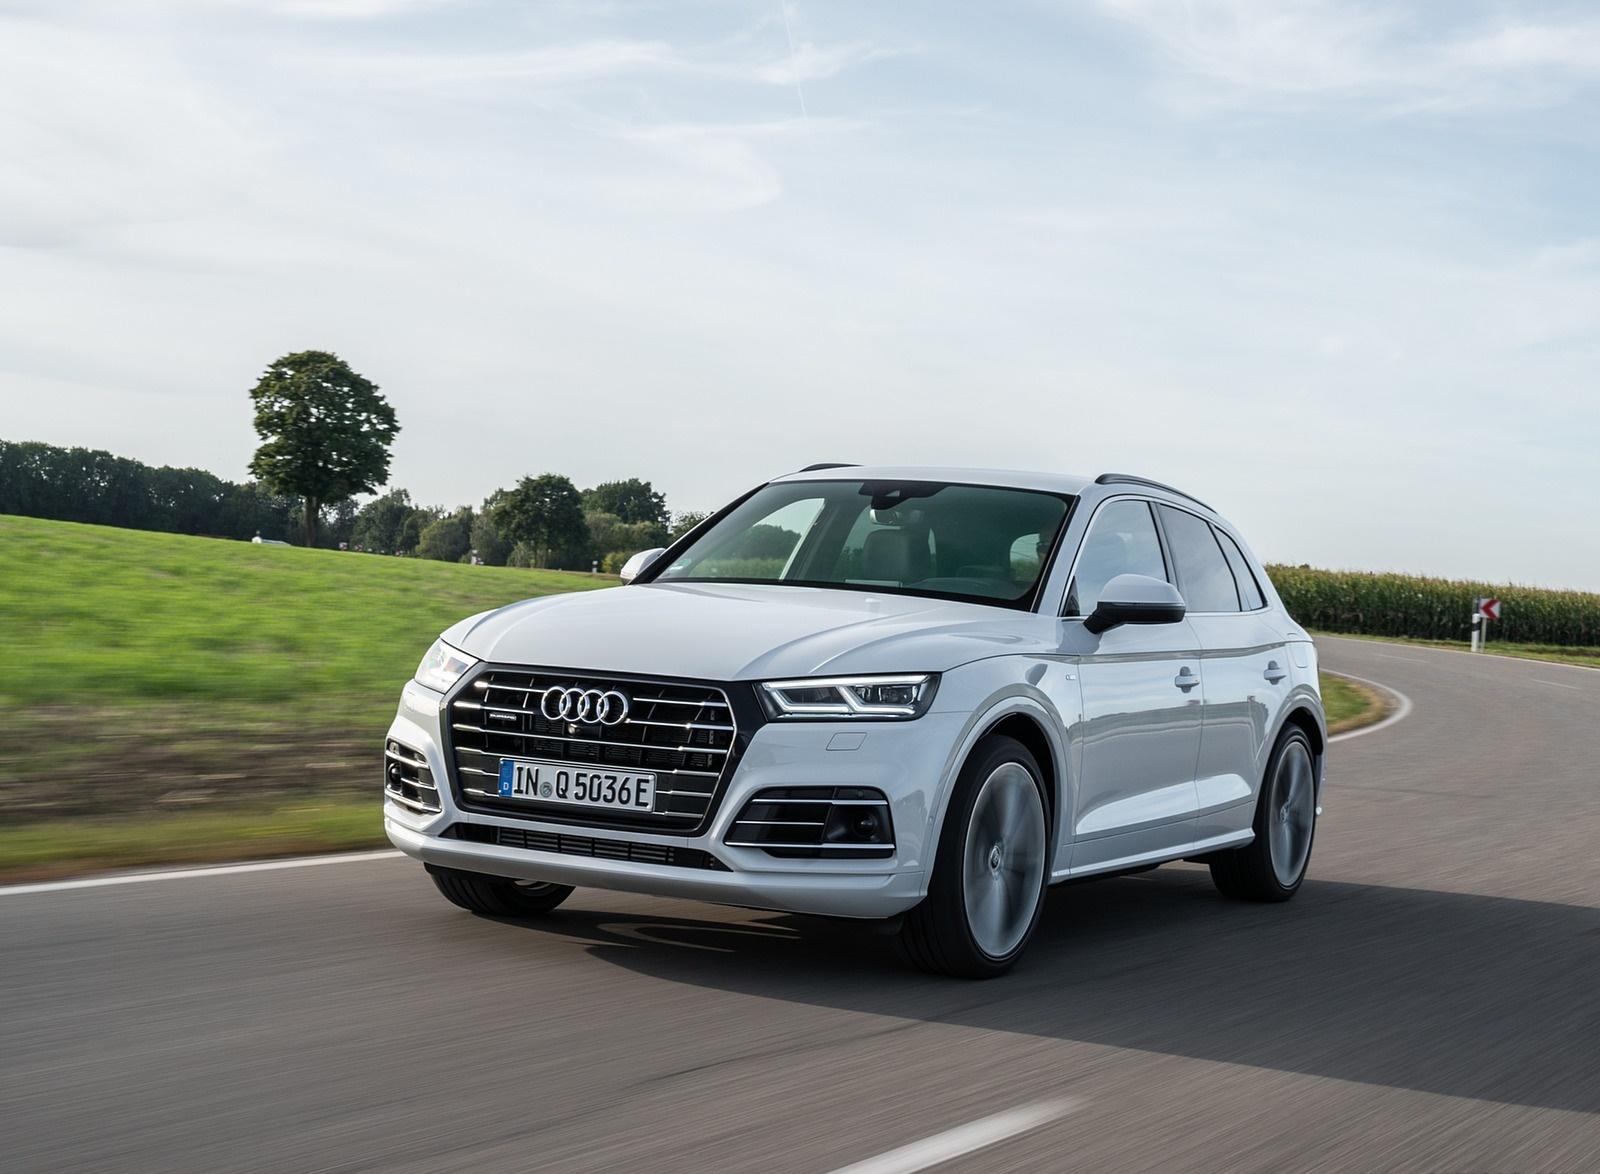 2020 Audi Q5 TFSI e Plug-In Hybrid (Color: Glacier White) Front Three-Quarter Wallpapers #12 of 154